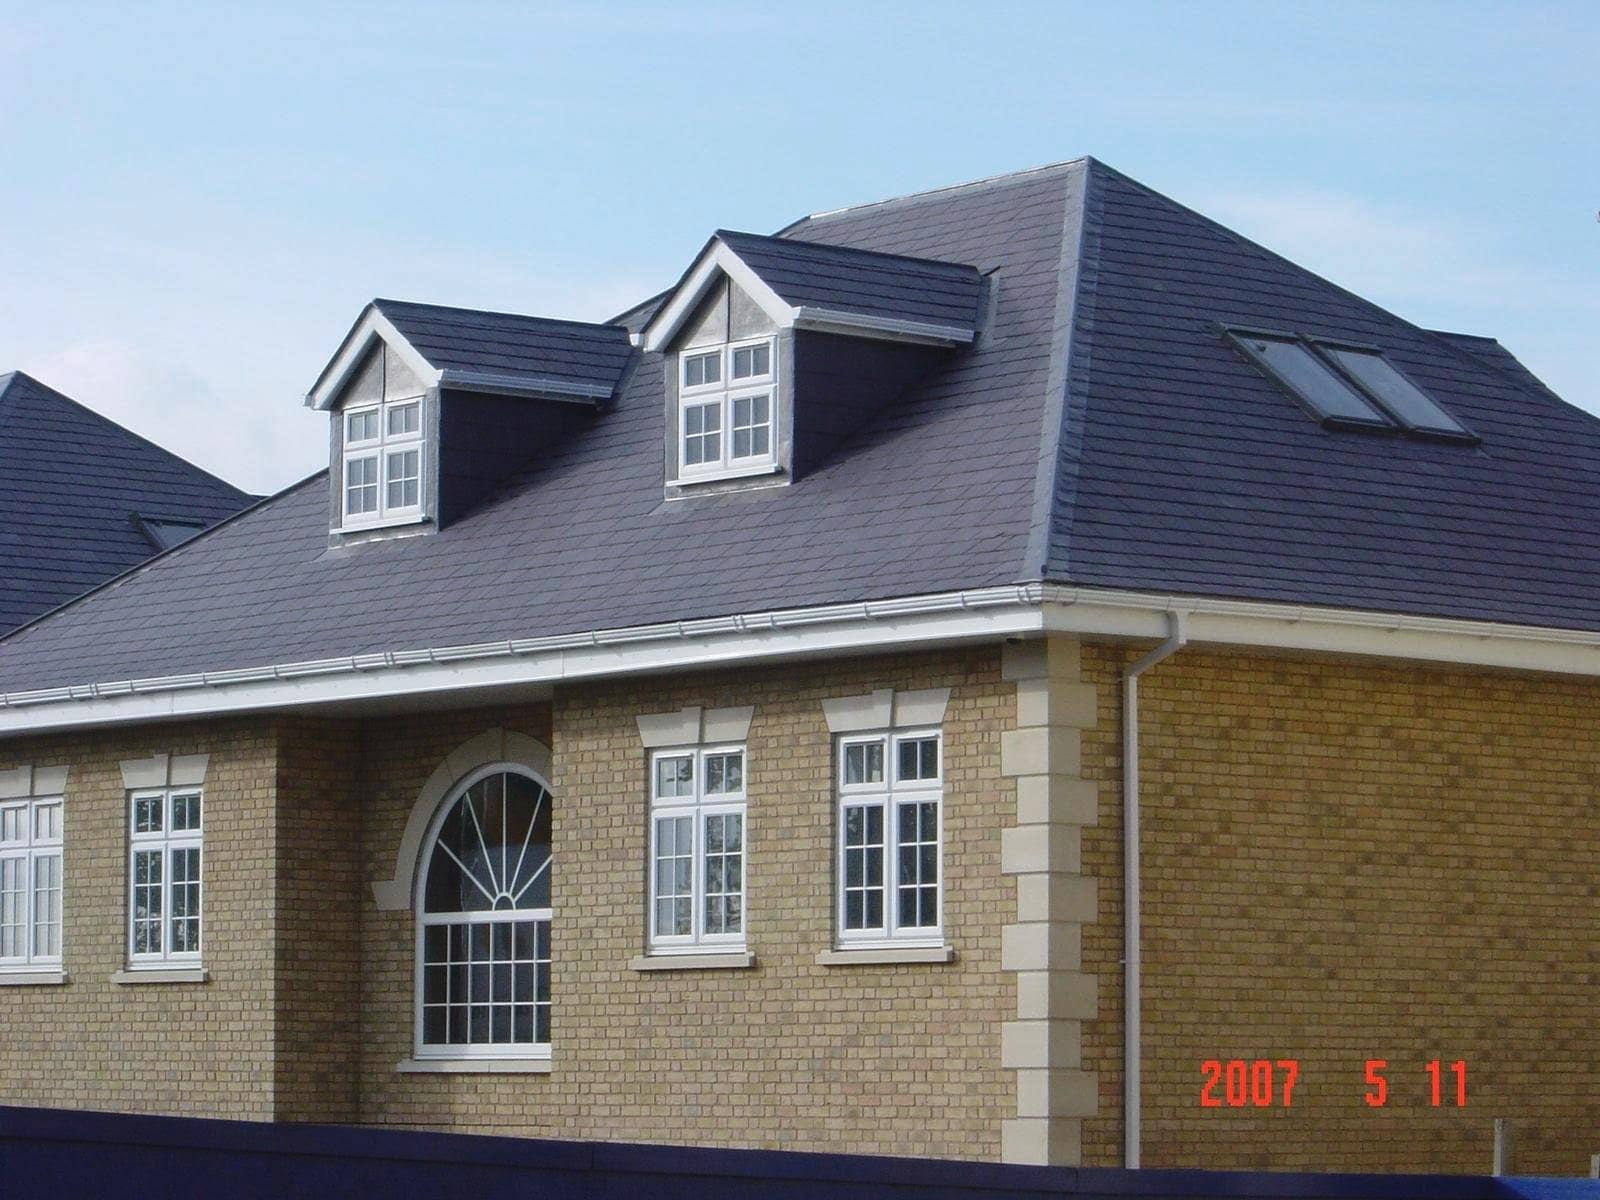 Oakland Roofing Ltd Sevenoaks Roofing Services